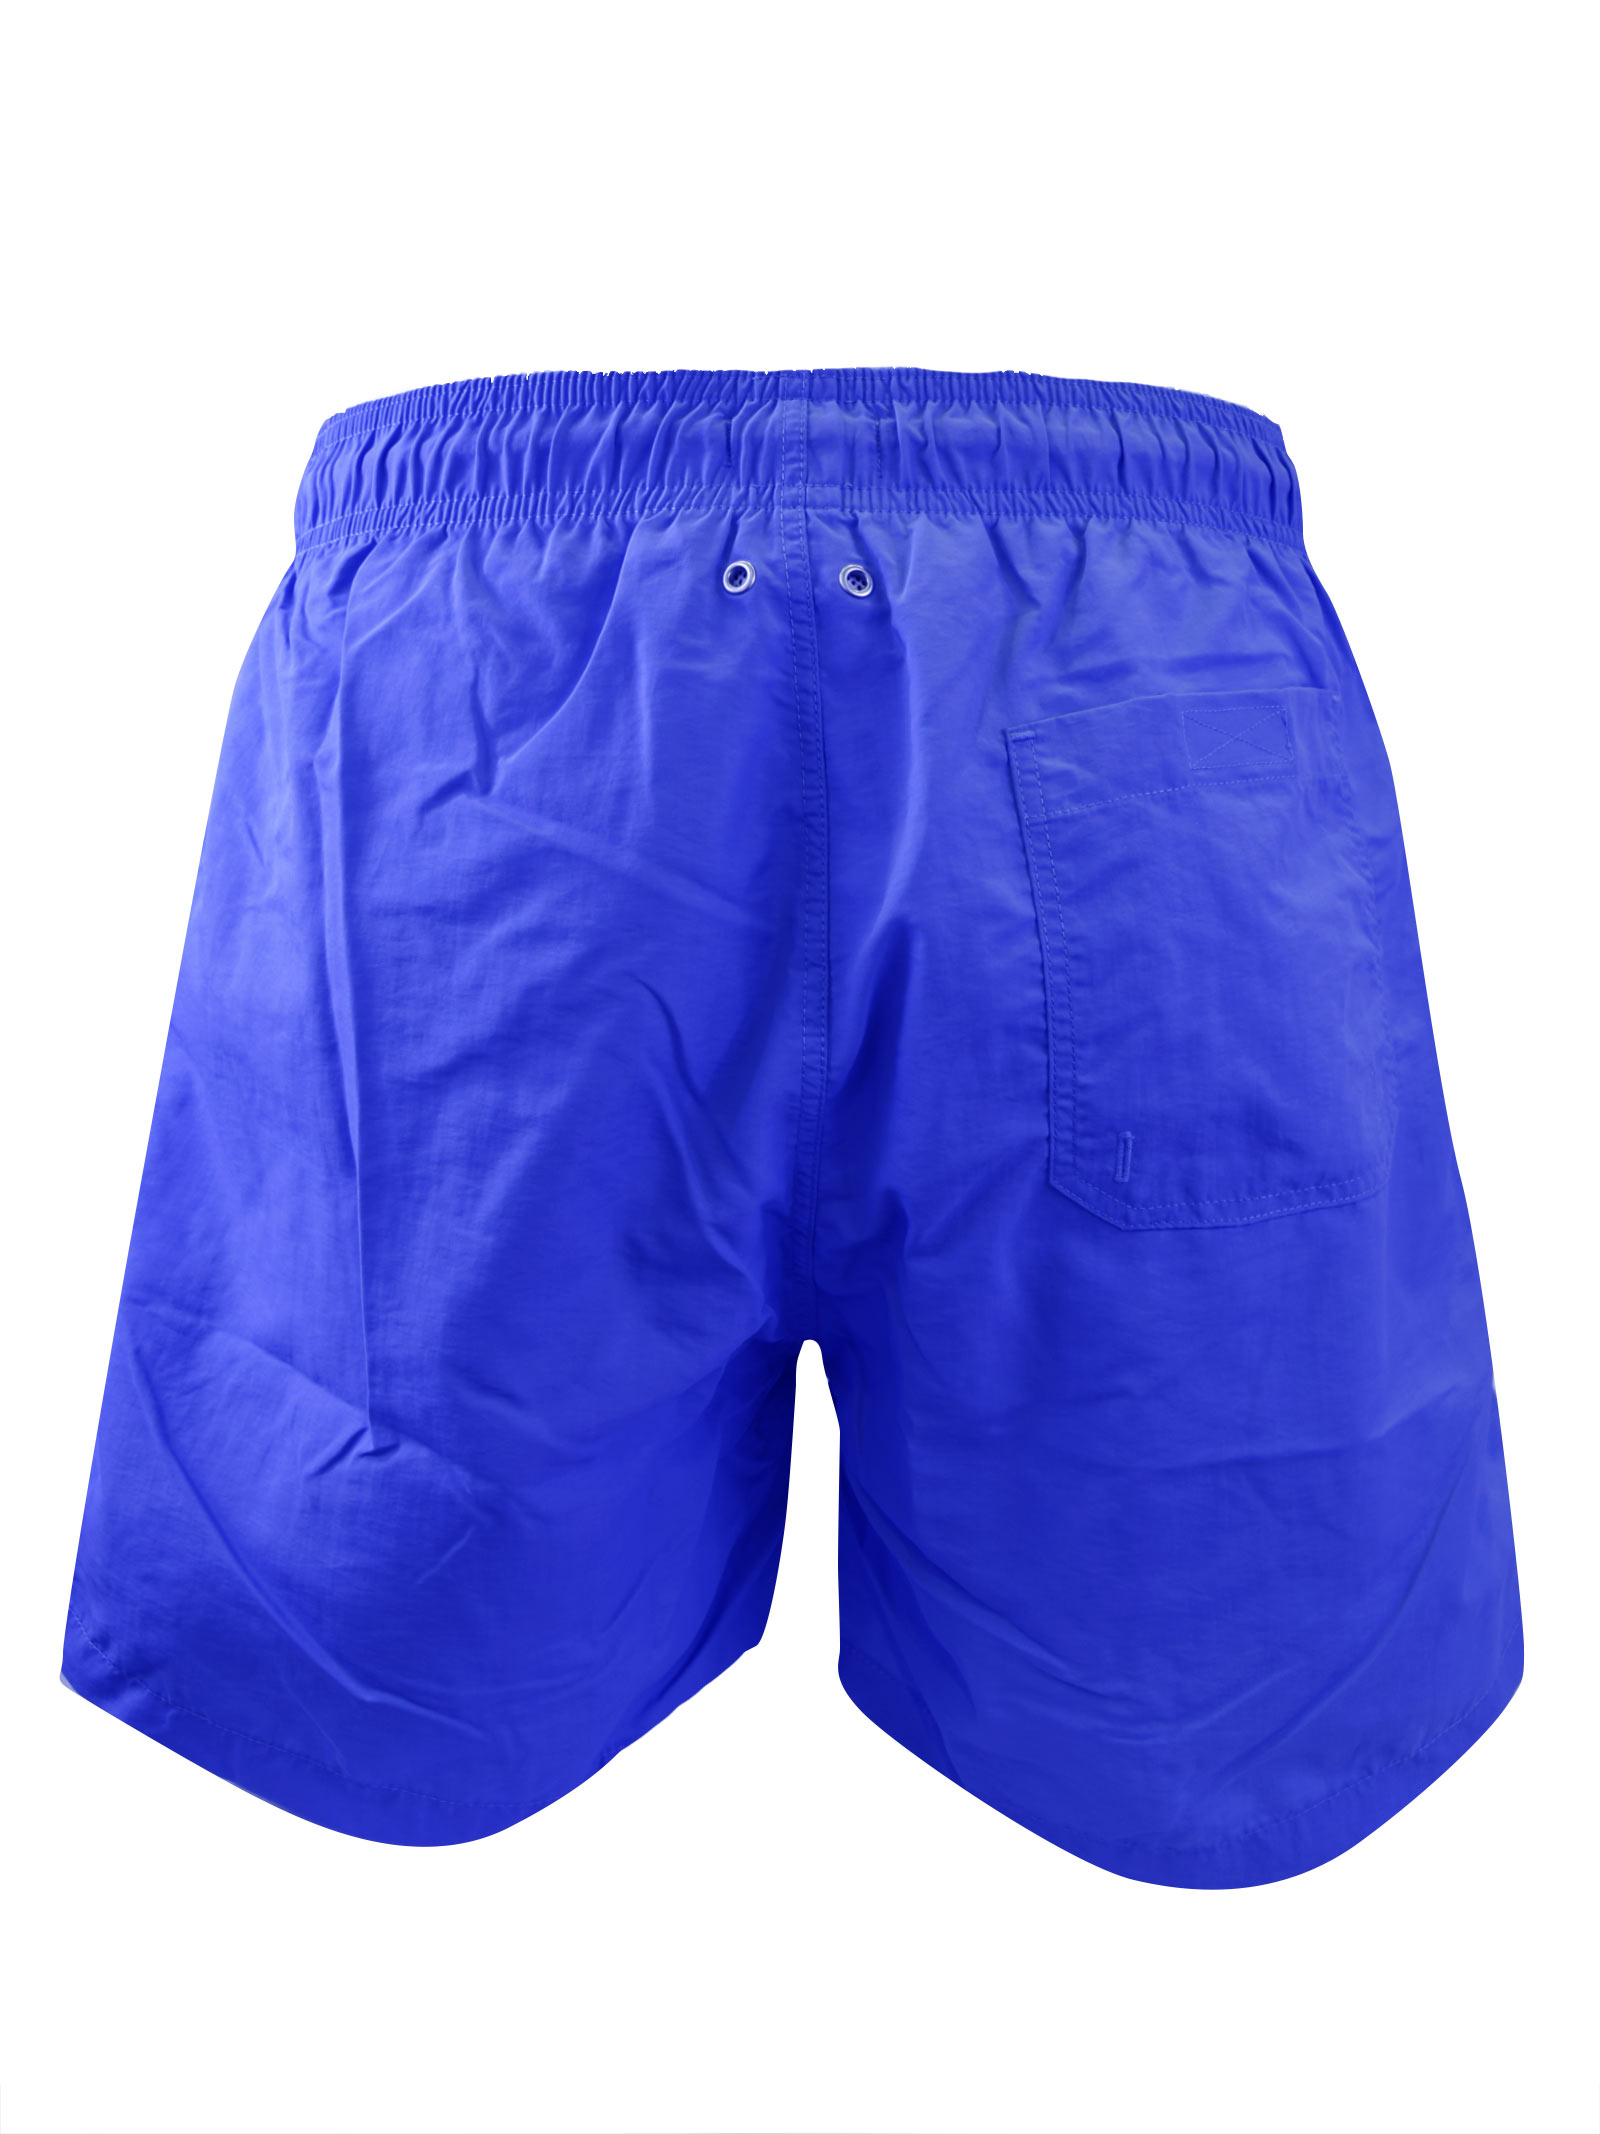 solid color swim trunk  GANT |  | 922016001422